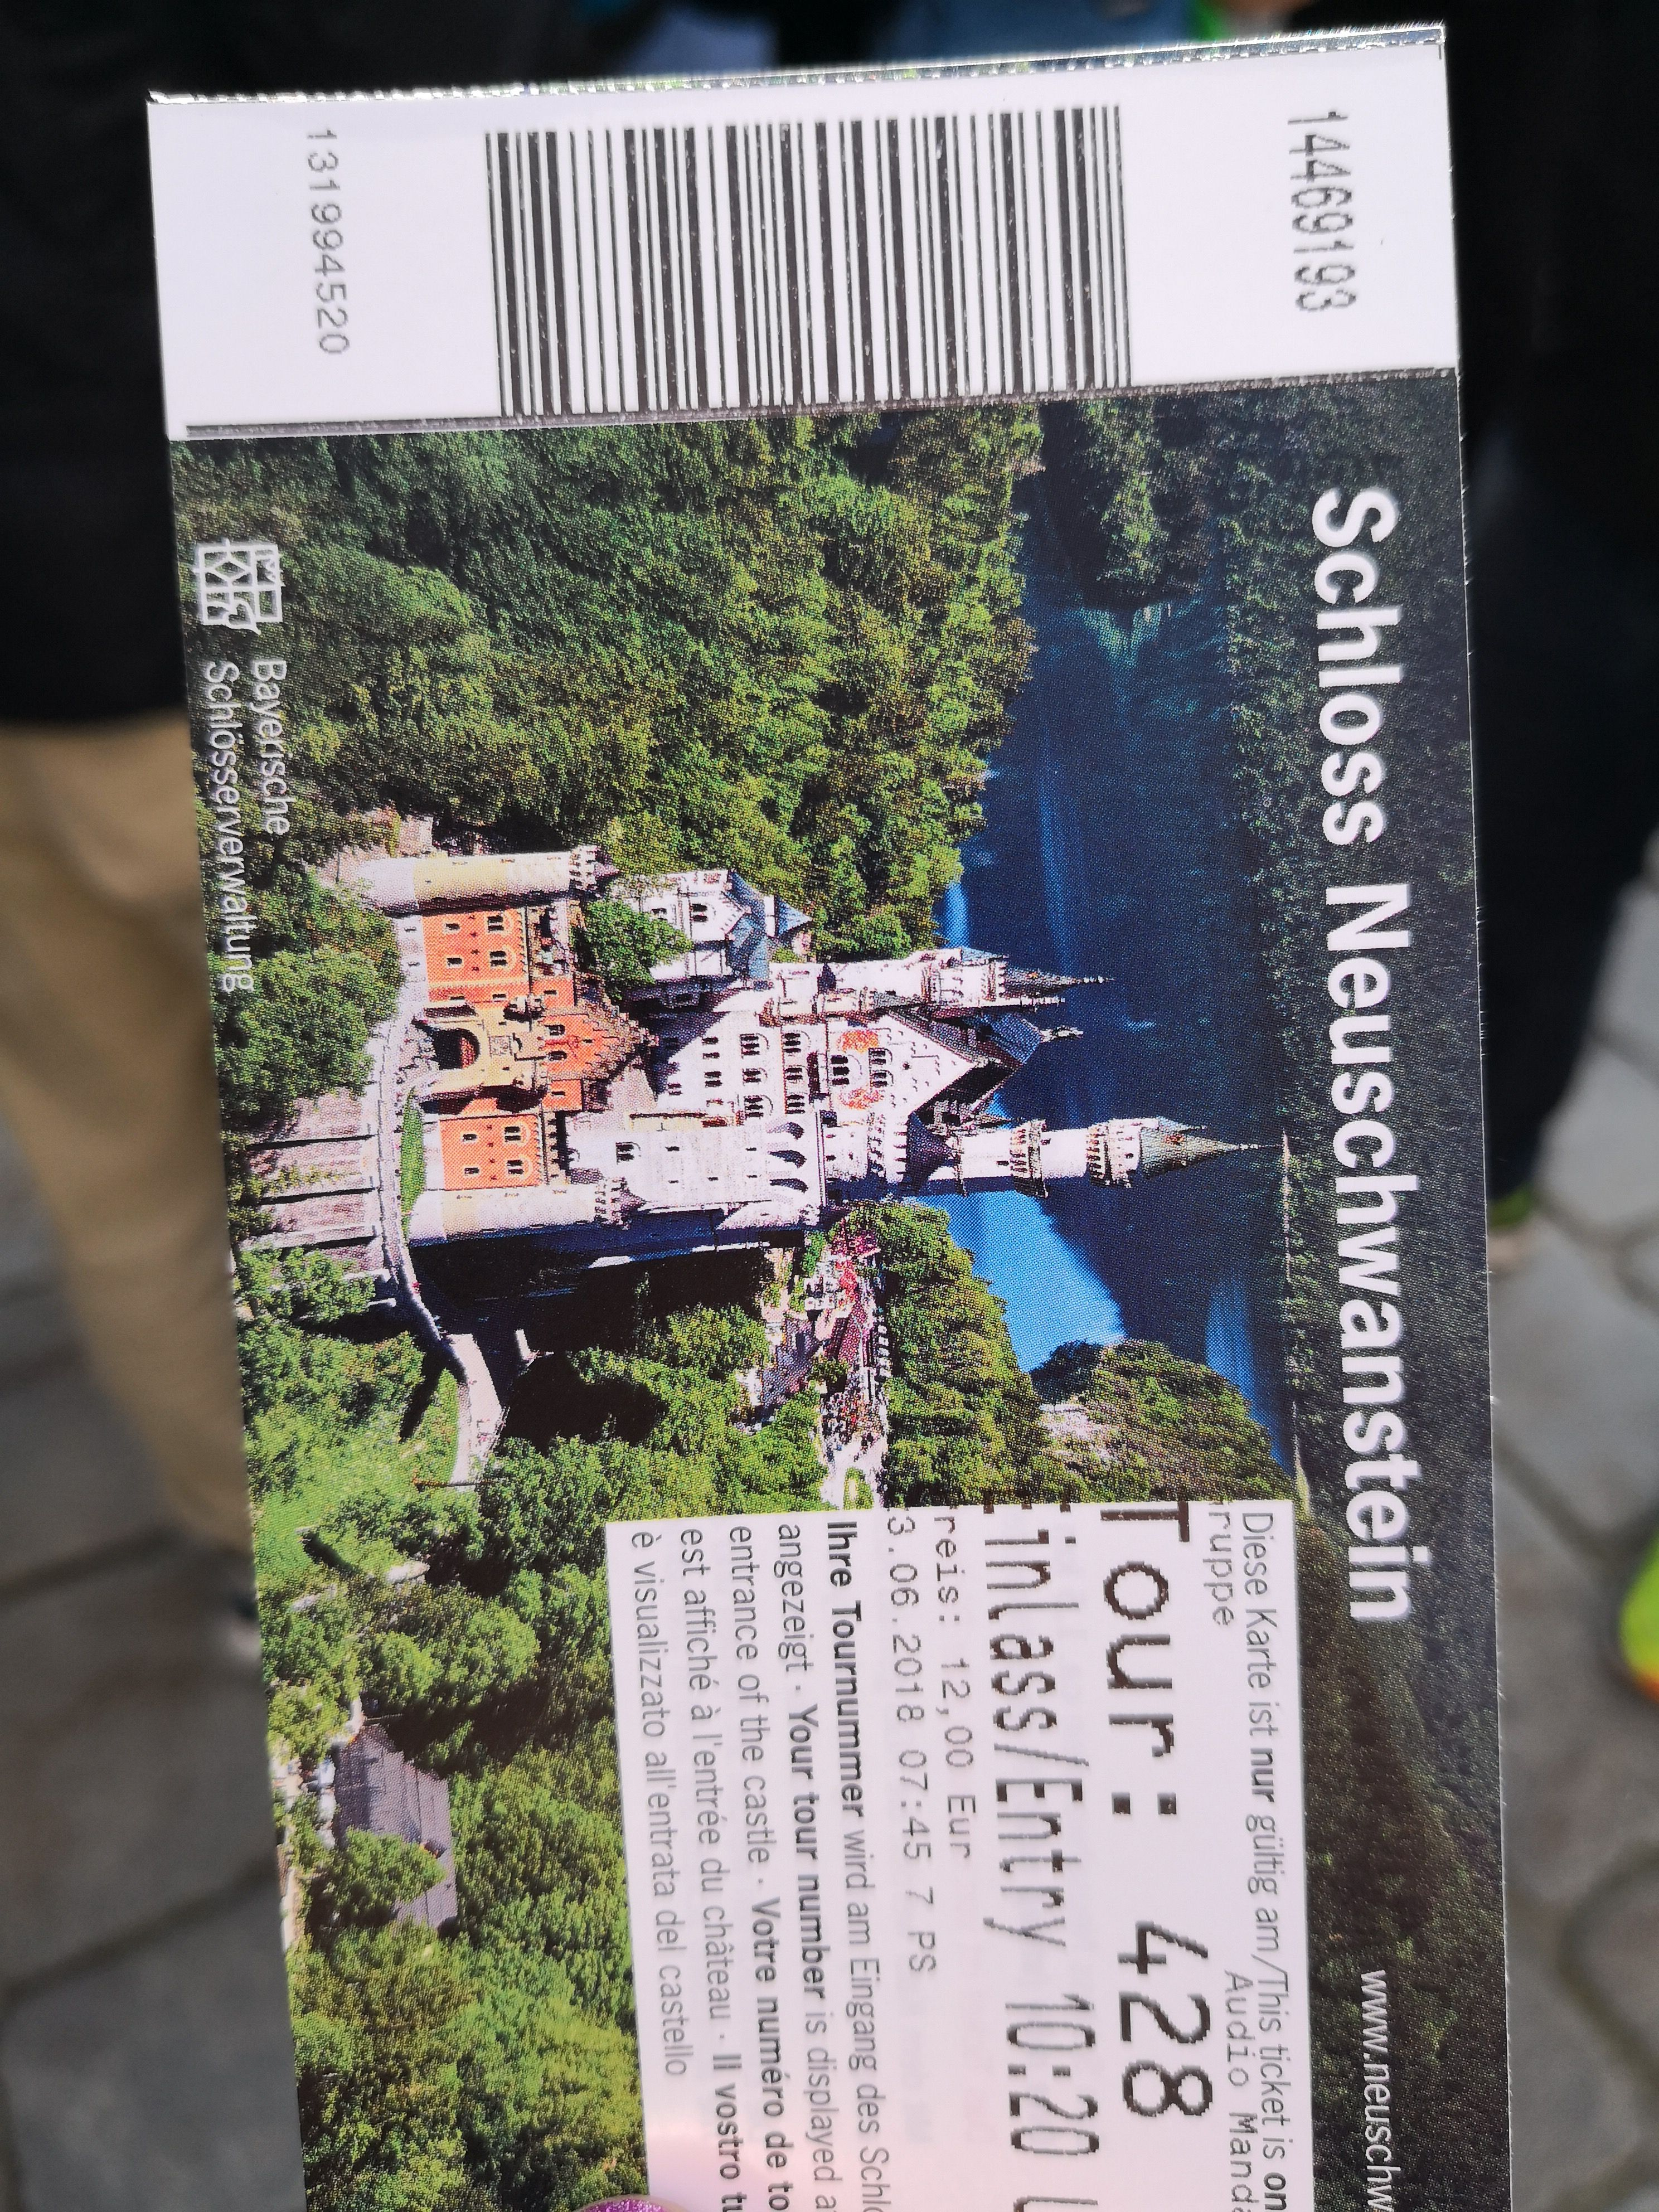 Ticket Marketing Trends Science And Technology Schloss Neuschwanstein